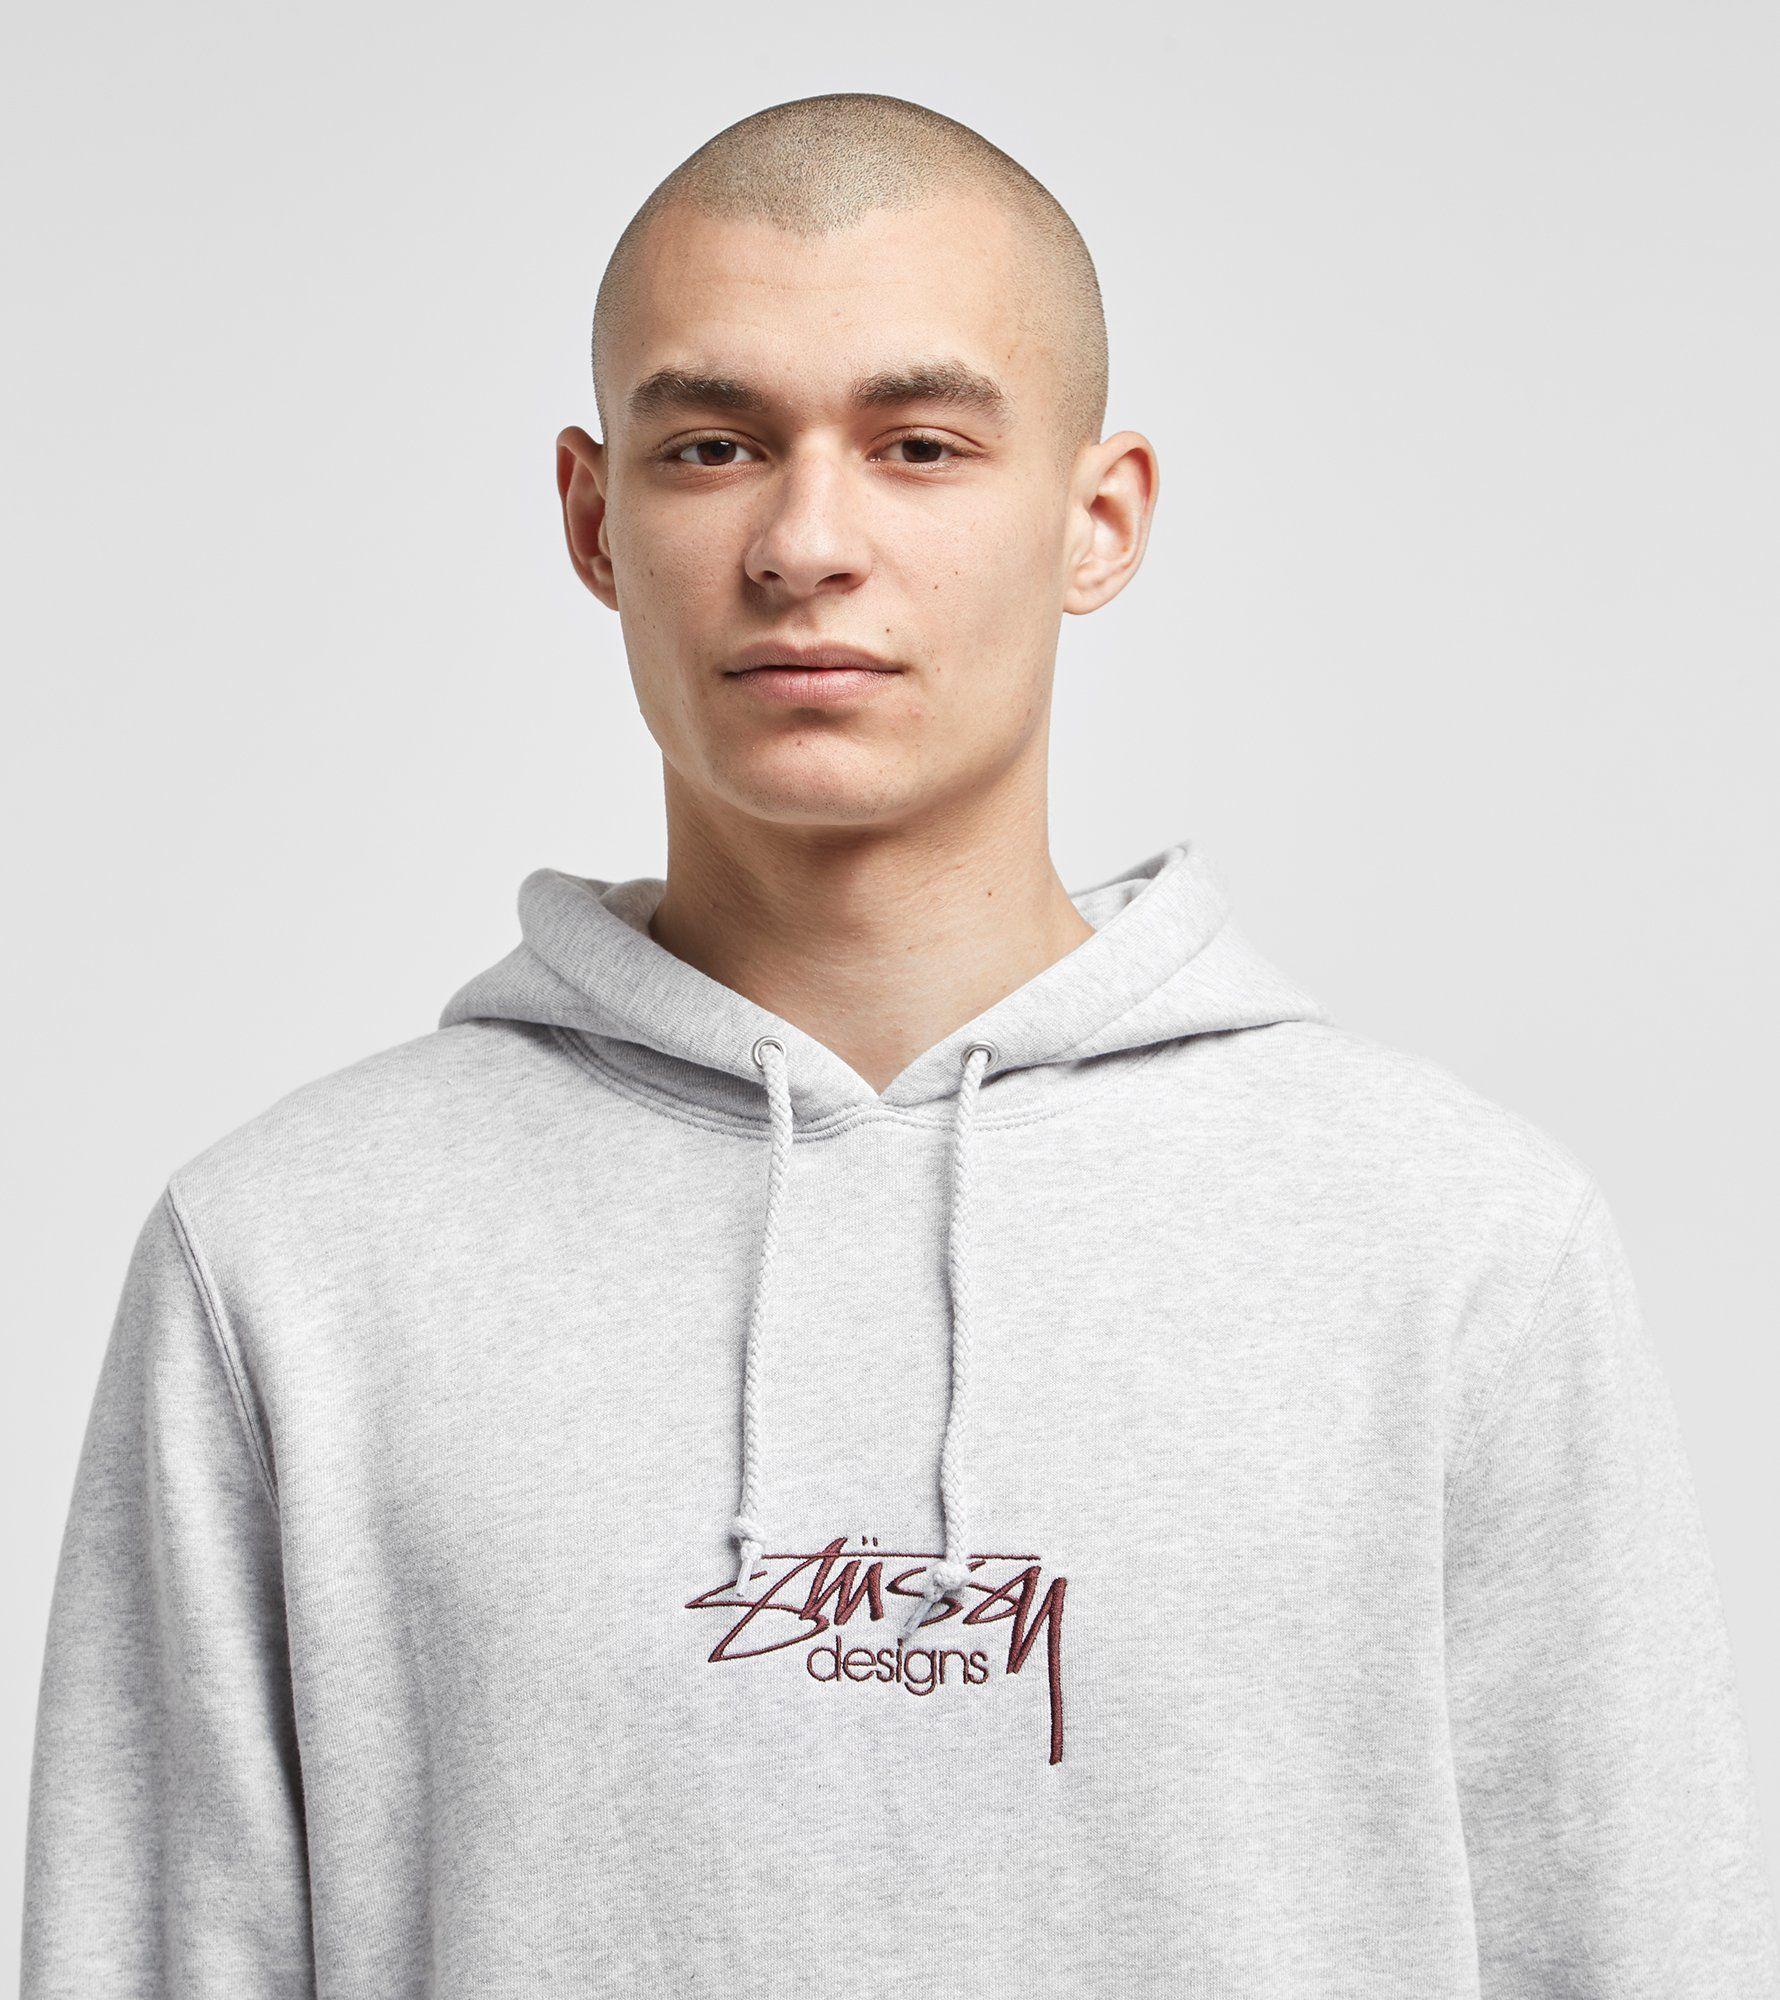 Stussy Design Applique Hoody